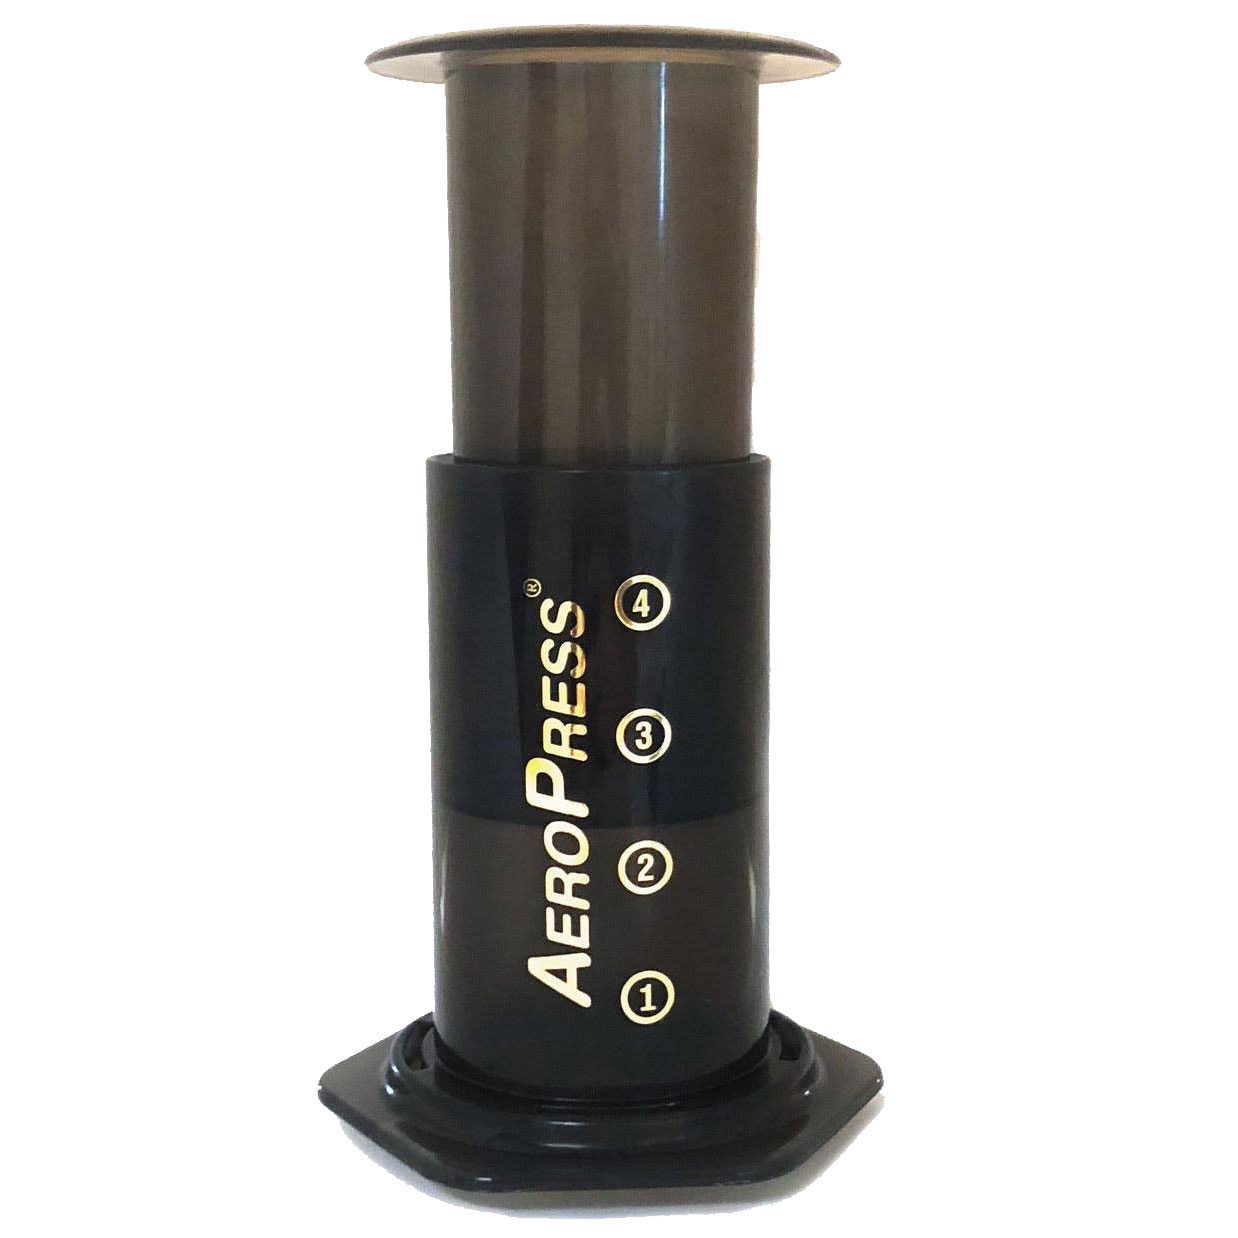 Aerobie AeroPress Coffee & Espresso Maker, Made in the USA